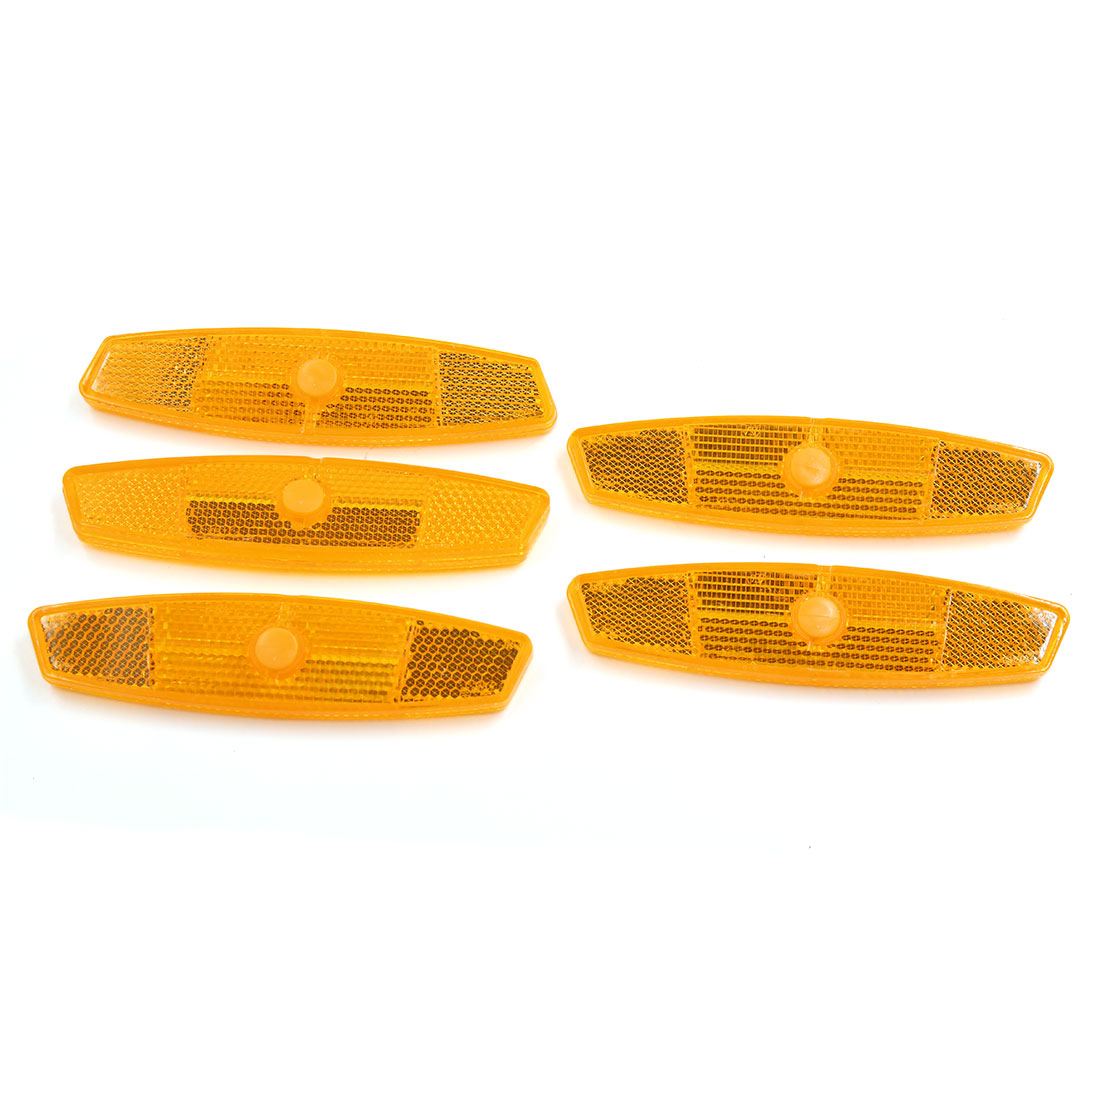 5pcs Orange Plastic Clip-on Reflective Warning Reflector for Bike Bicycle